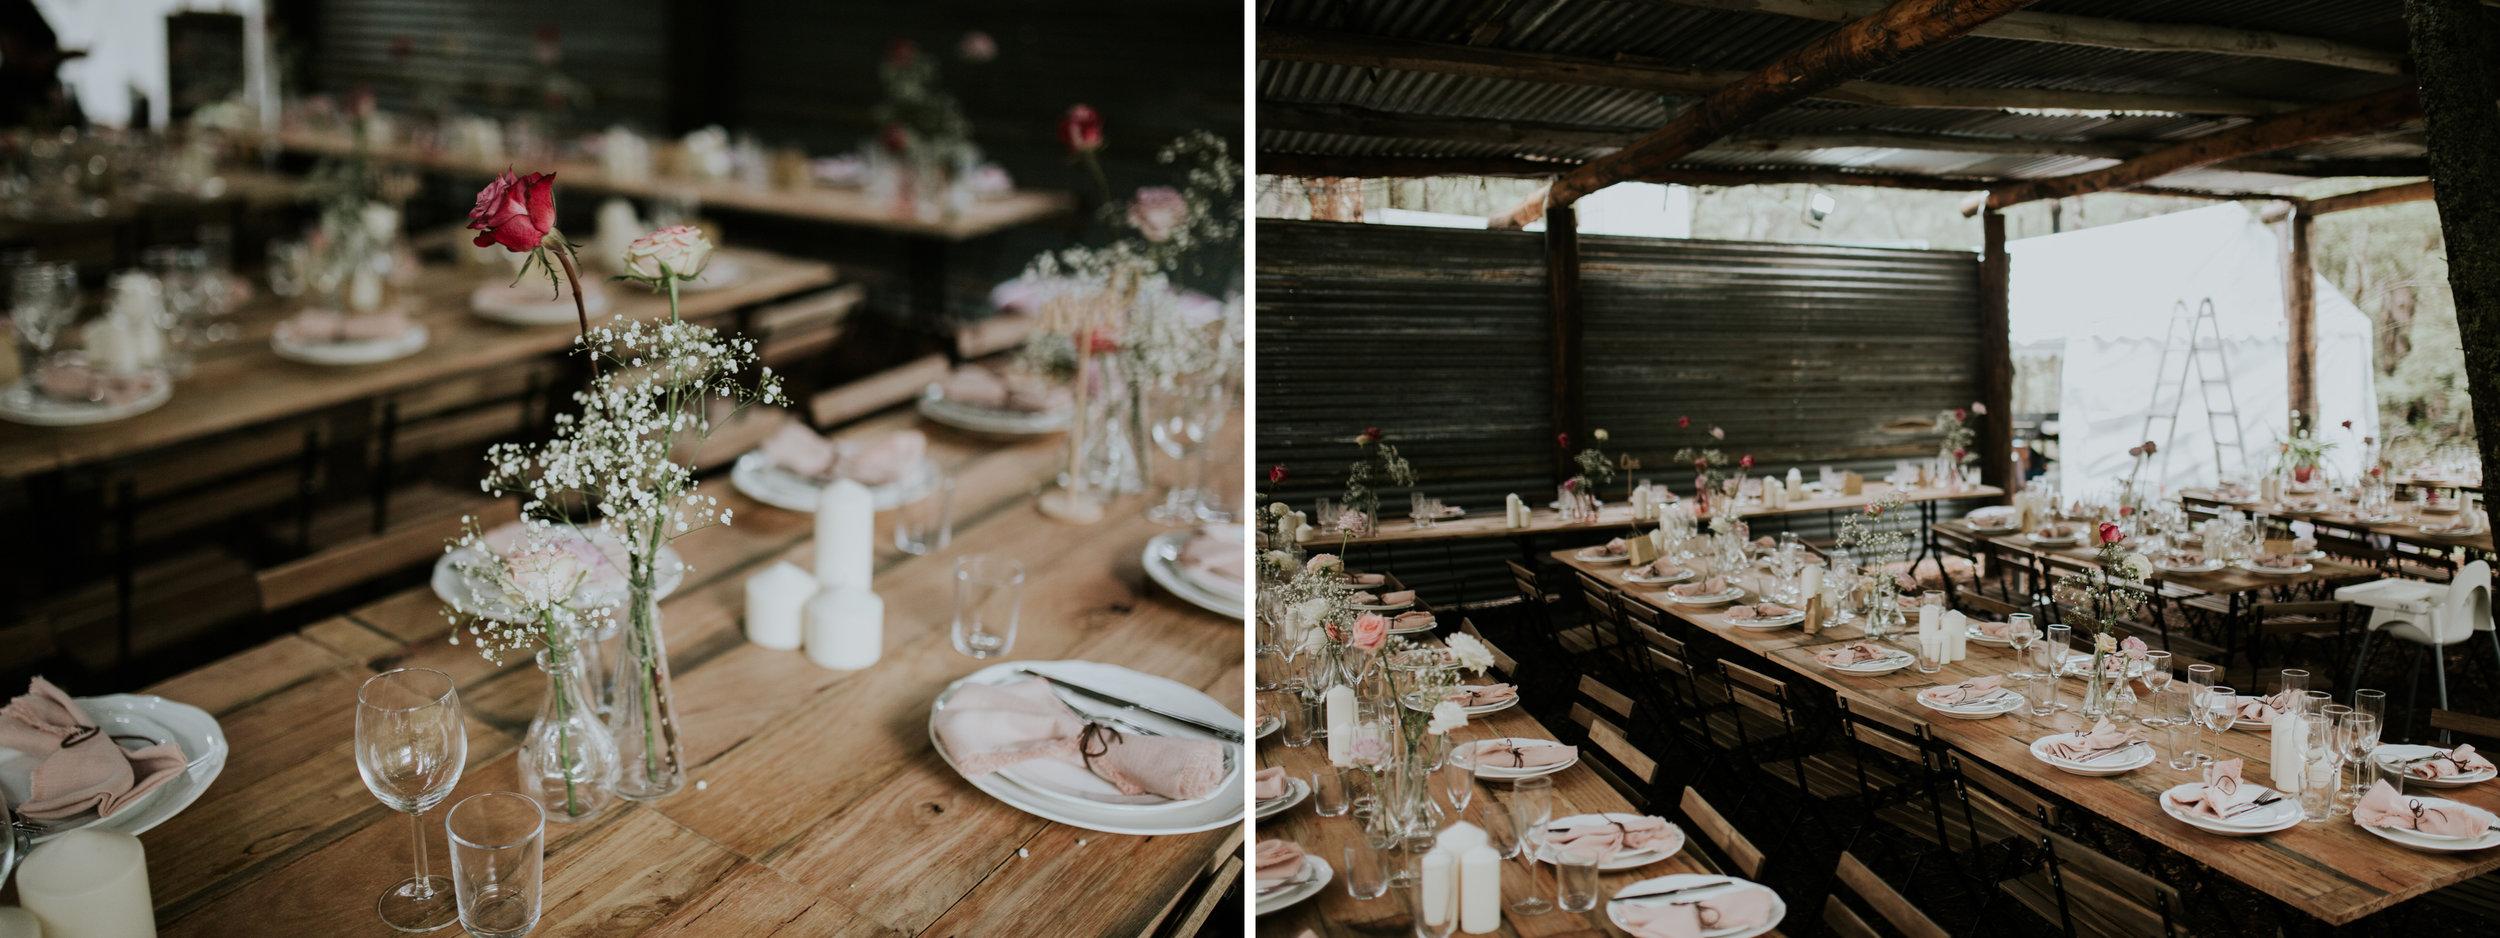 Emma+John+Plate+Table+Styling+Wedding+alanataylorphotography.jpg